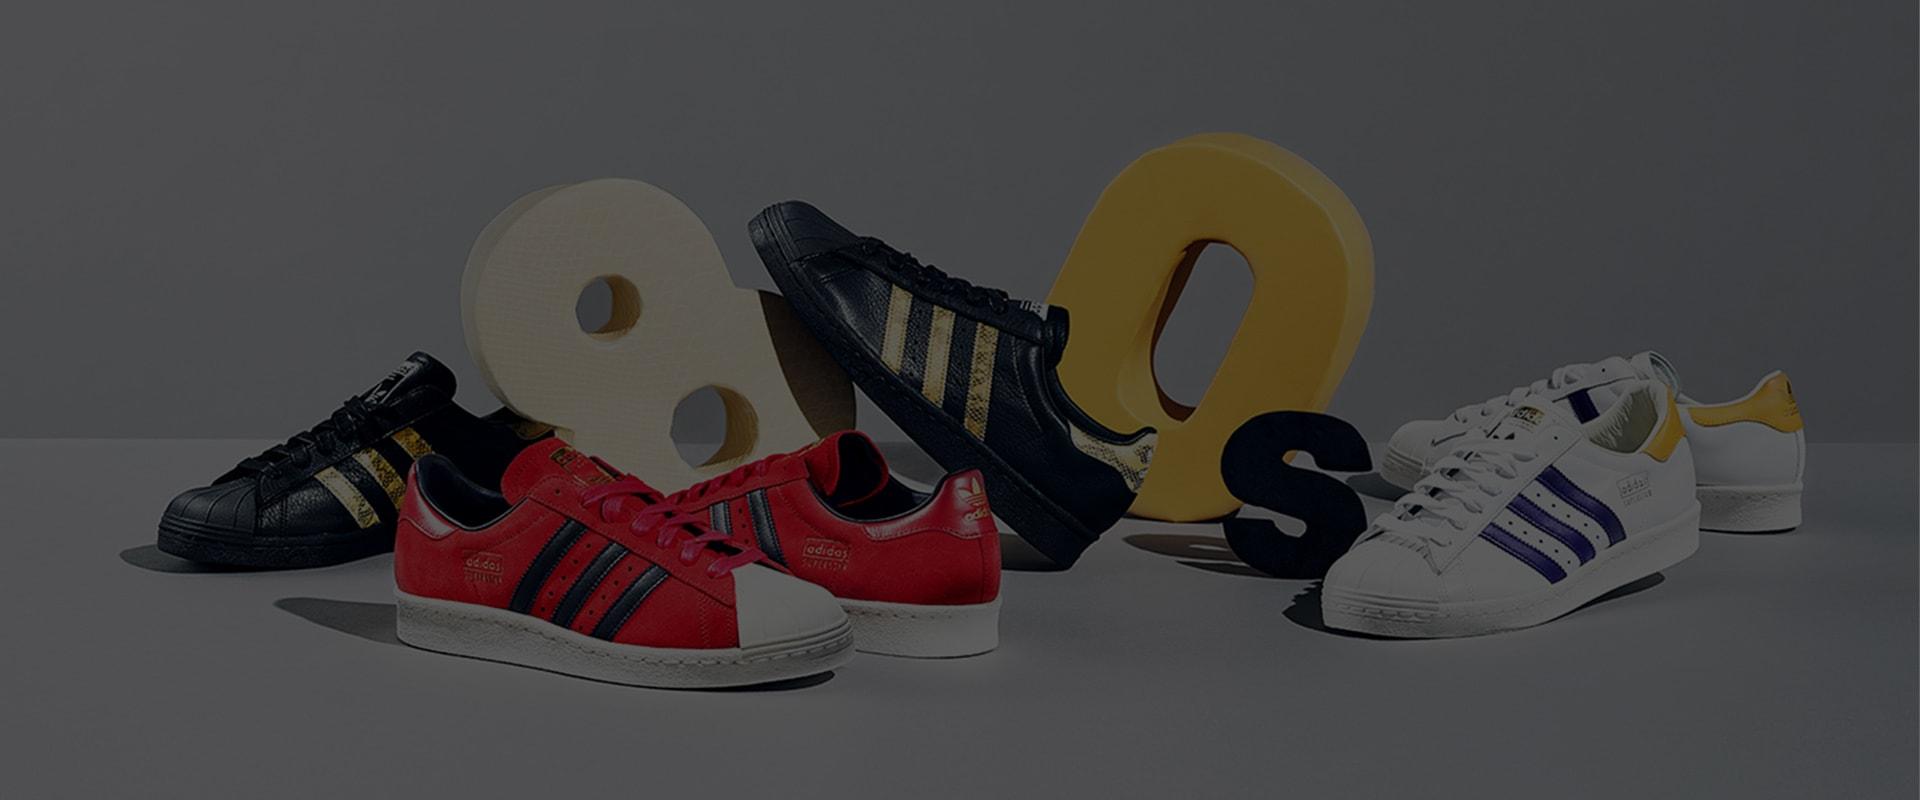 Canada Canada Tes Adidas Adidas Personnalise Personnalise Tes Adidas ChaussuresMi Tes ChaussuresMi Personnalise ChaussuresMi 6Yvbgf7y